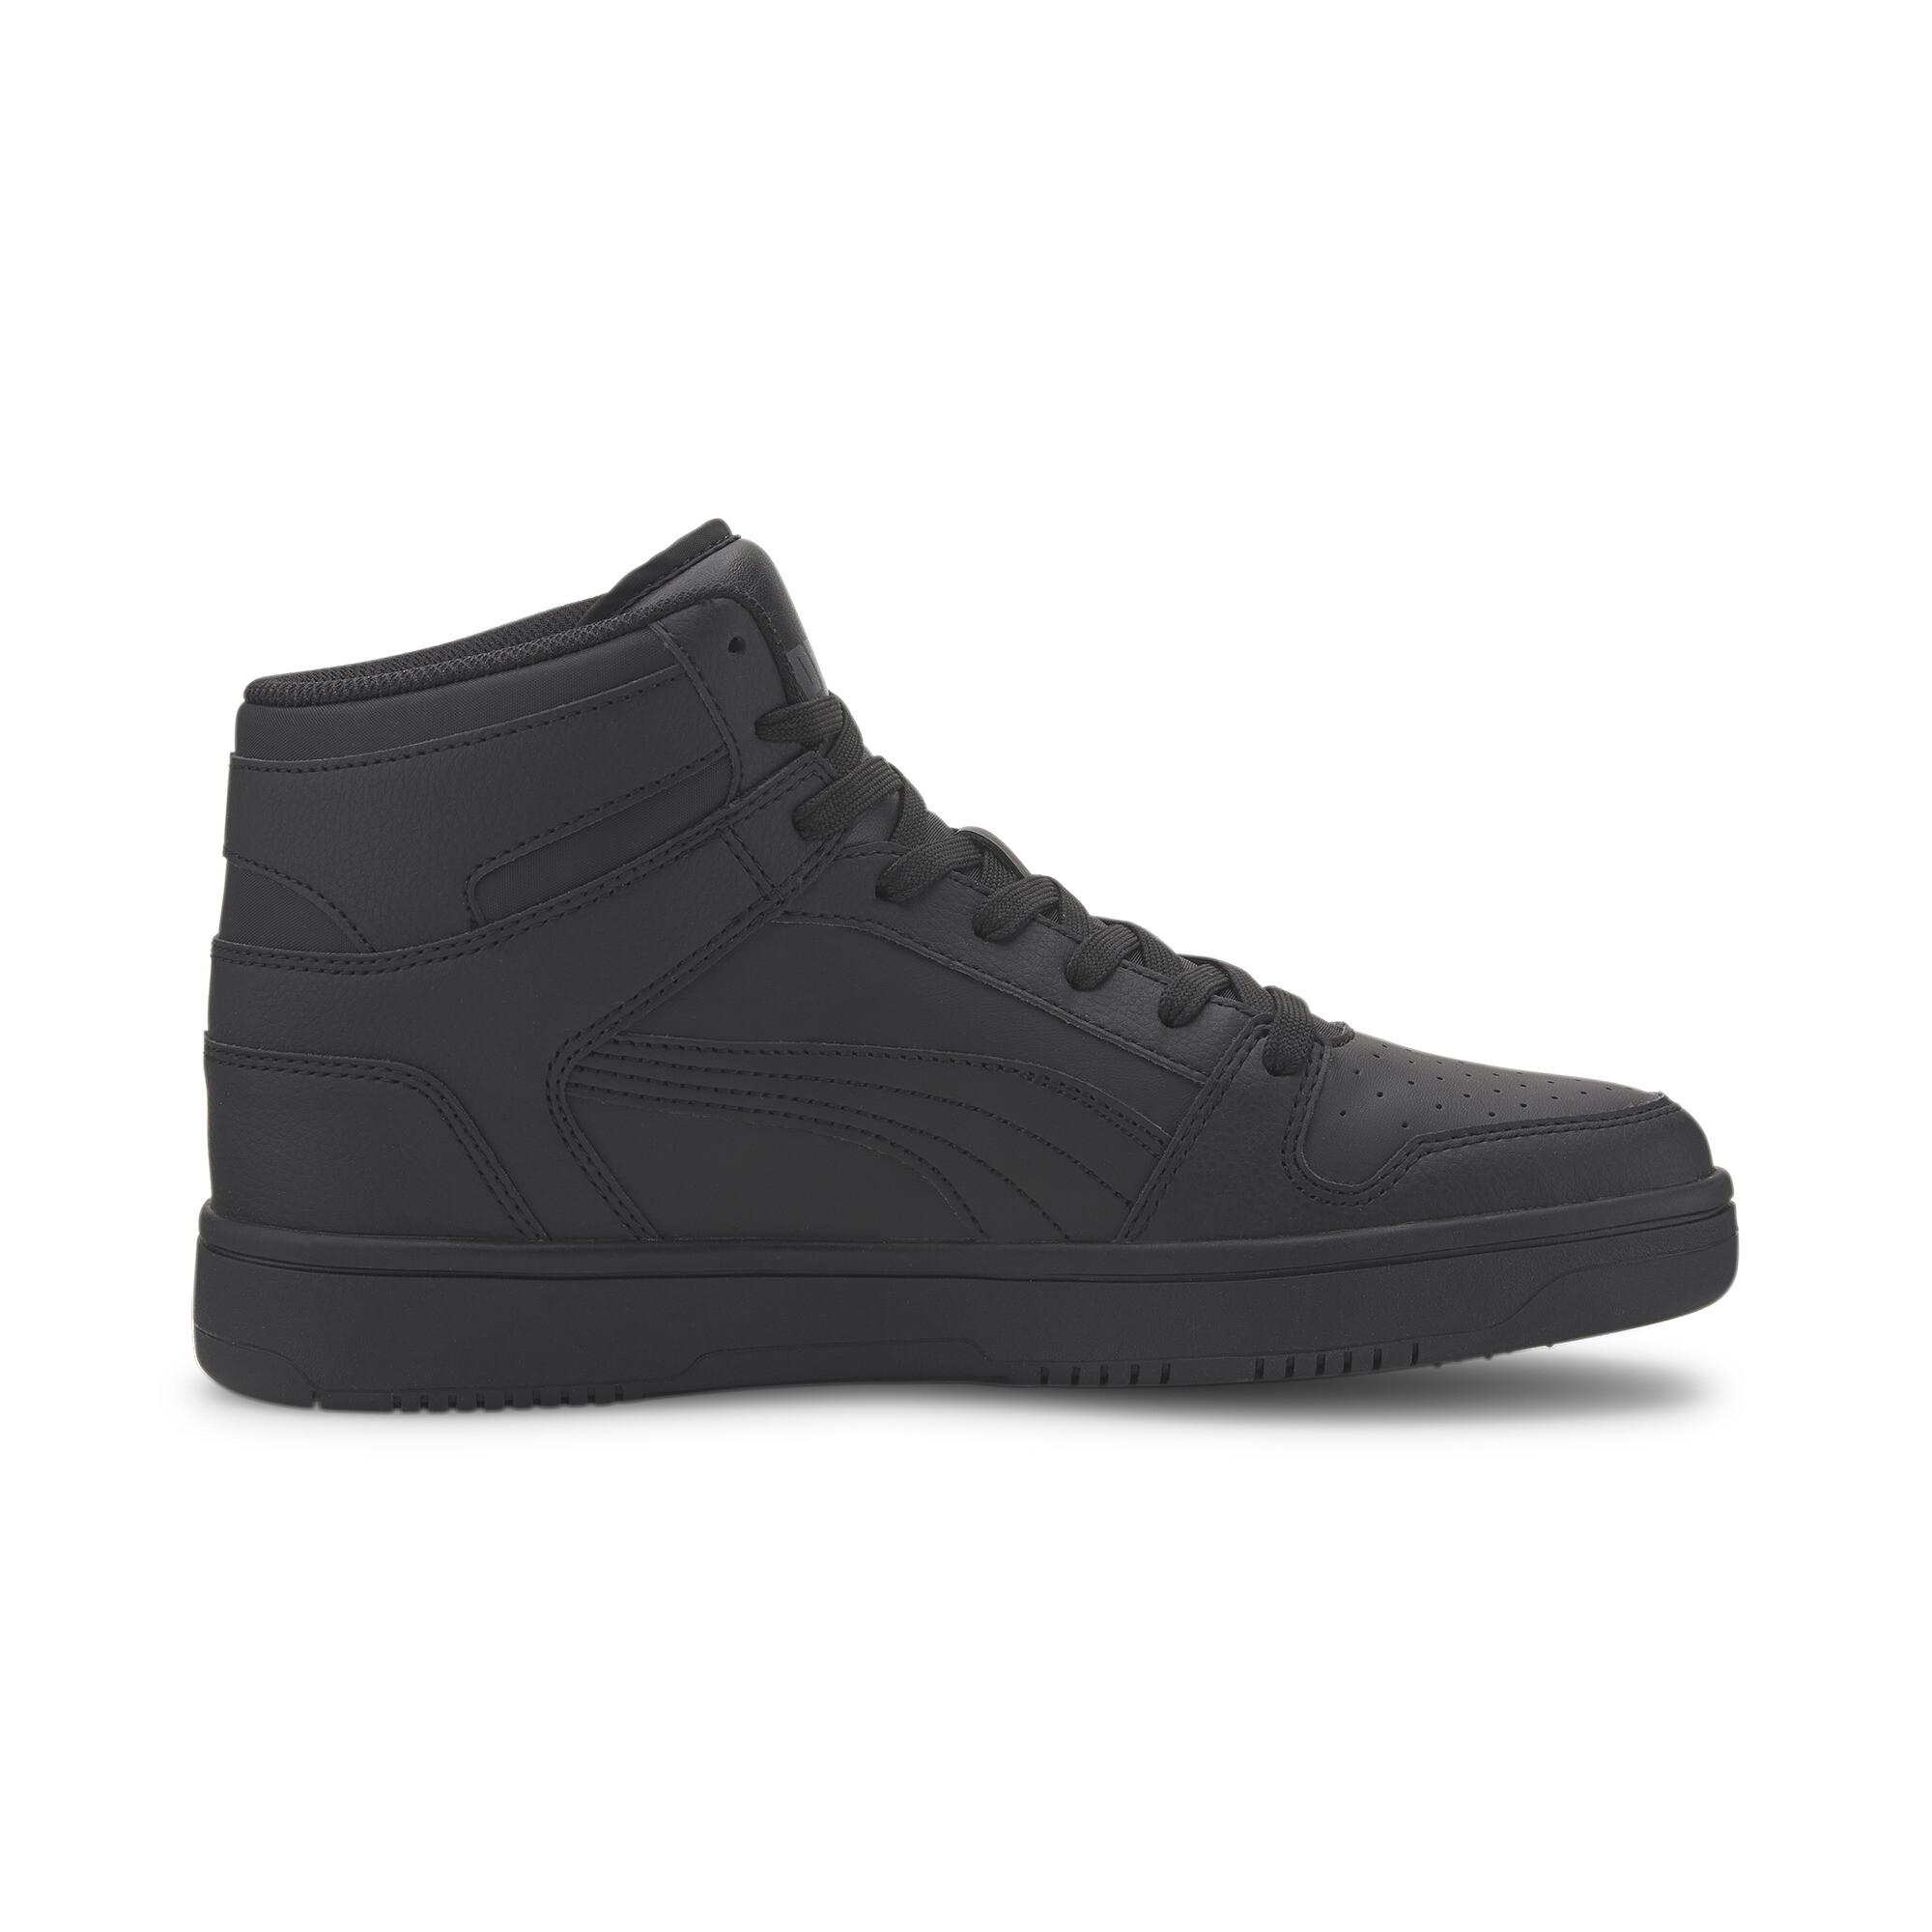 miniature 8 - Puma Men's Rebound LayUp Sneakers